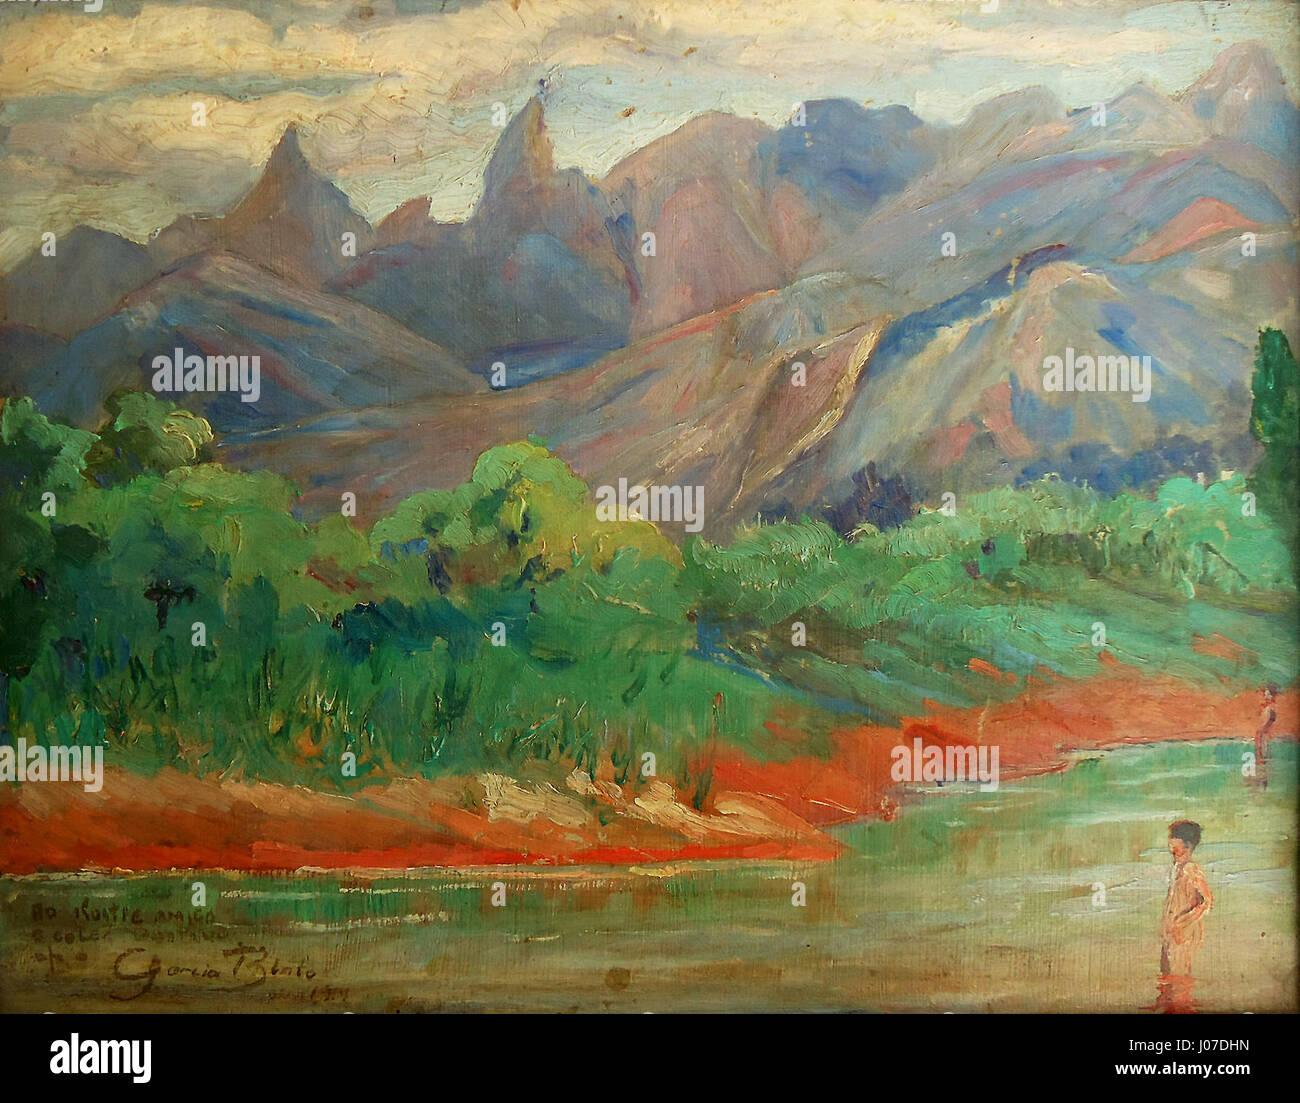 Garcia Bento, Teresópolis, óleo sobre madeira, c 1914-19, 27 x 35 cm, Photo Gedley Belchior Braga - Stock Image